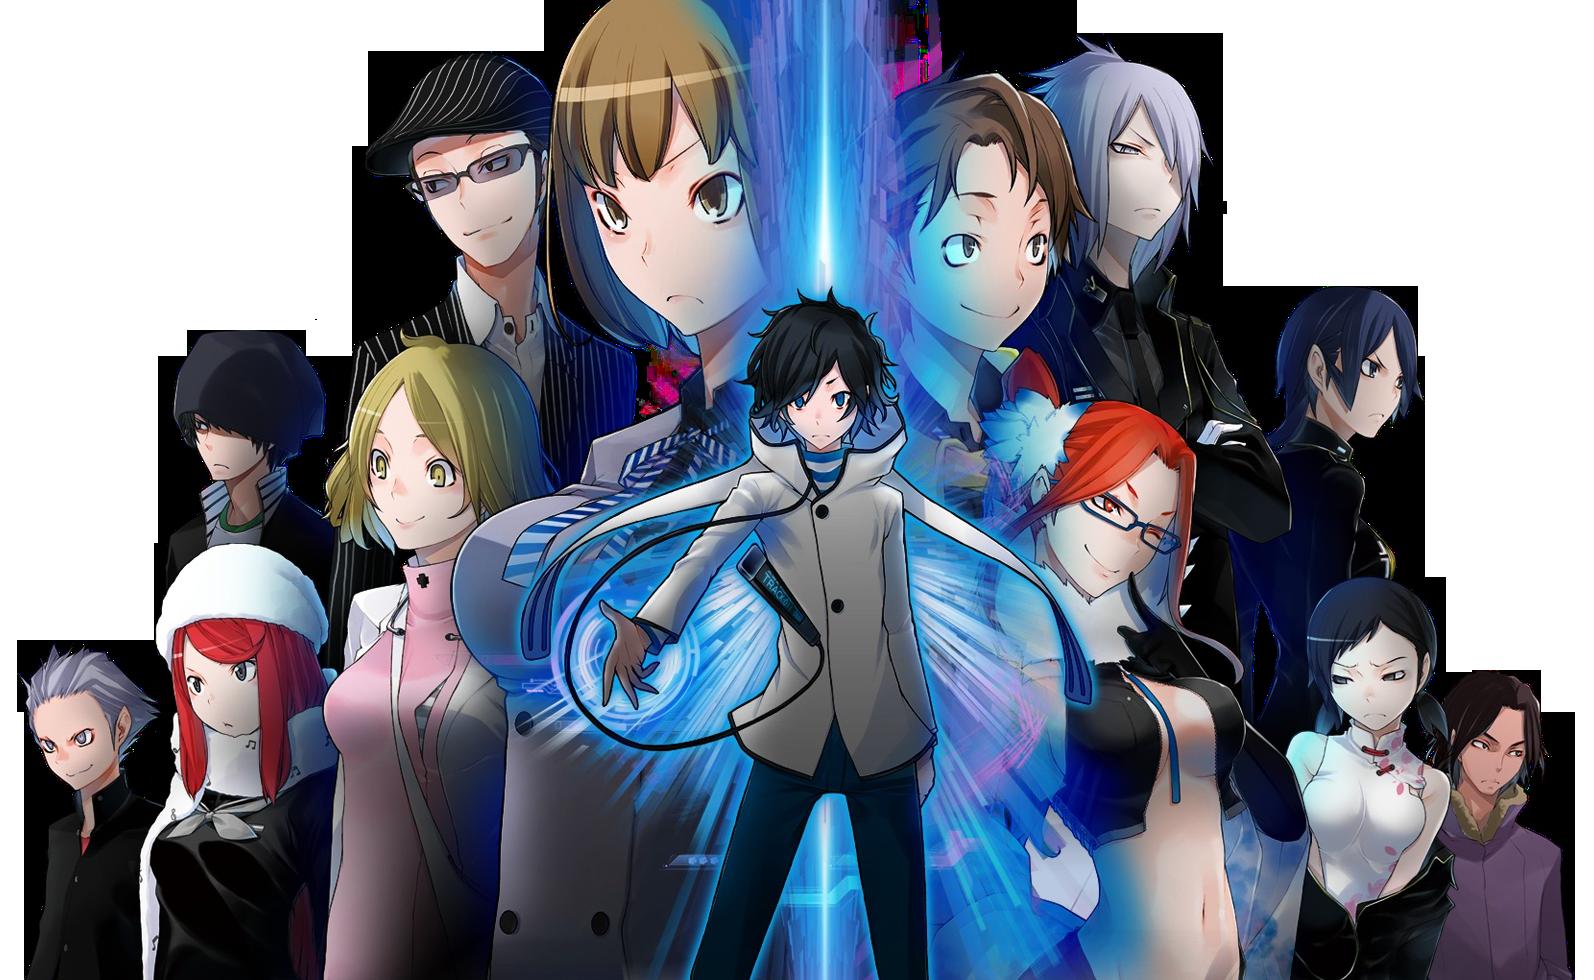 Devil Survivor 2 Anime Characters : Devil survivor record breaker s additions make this ds